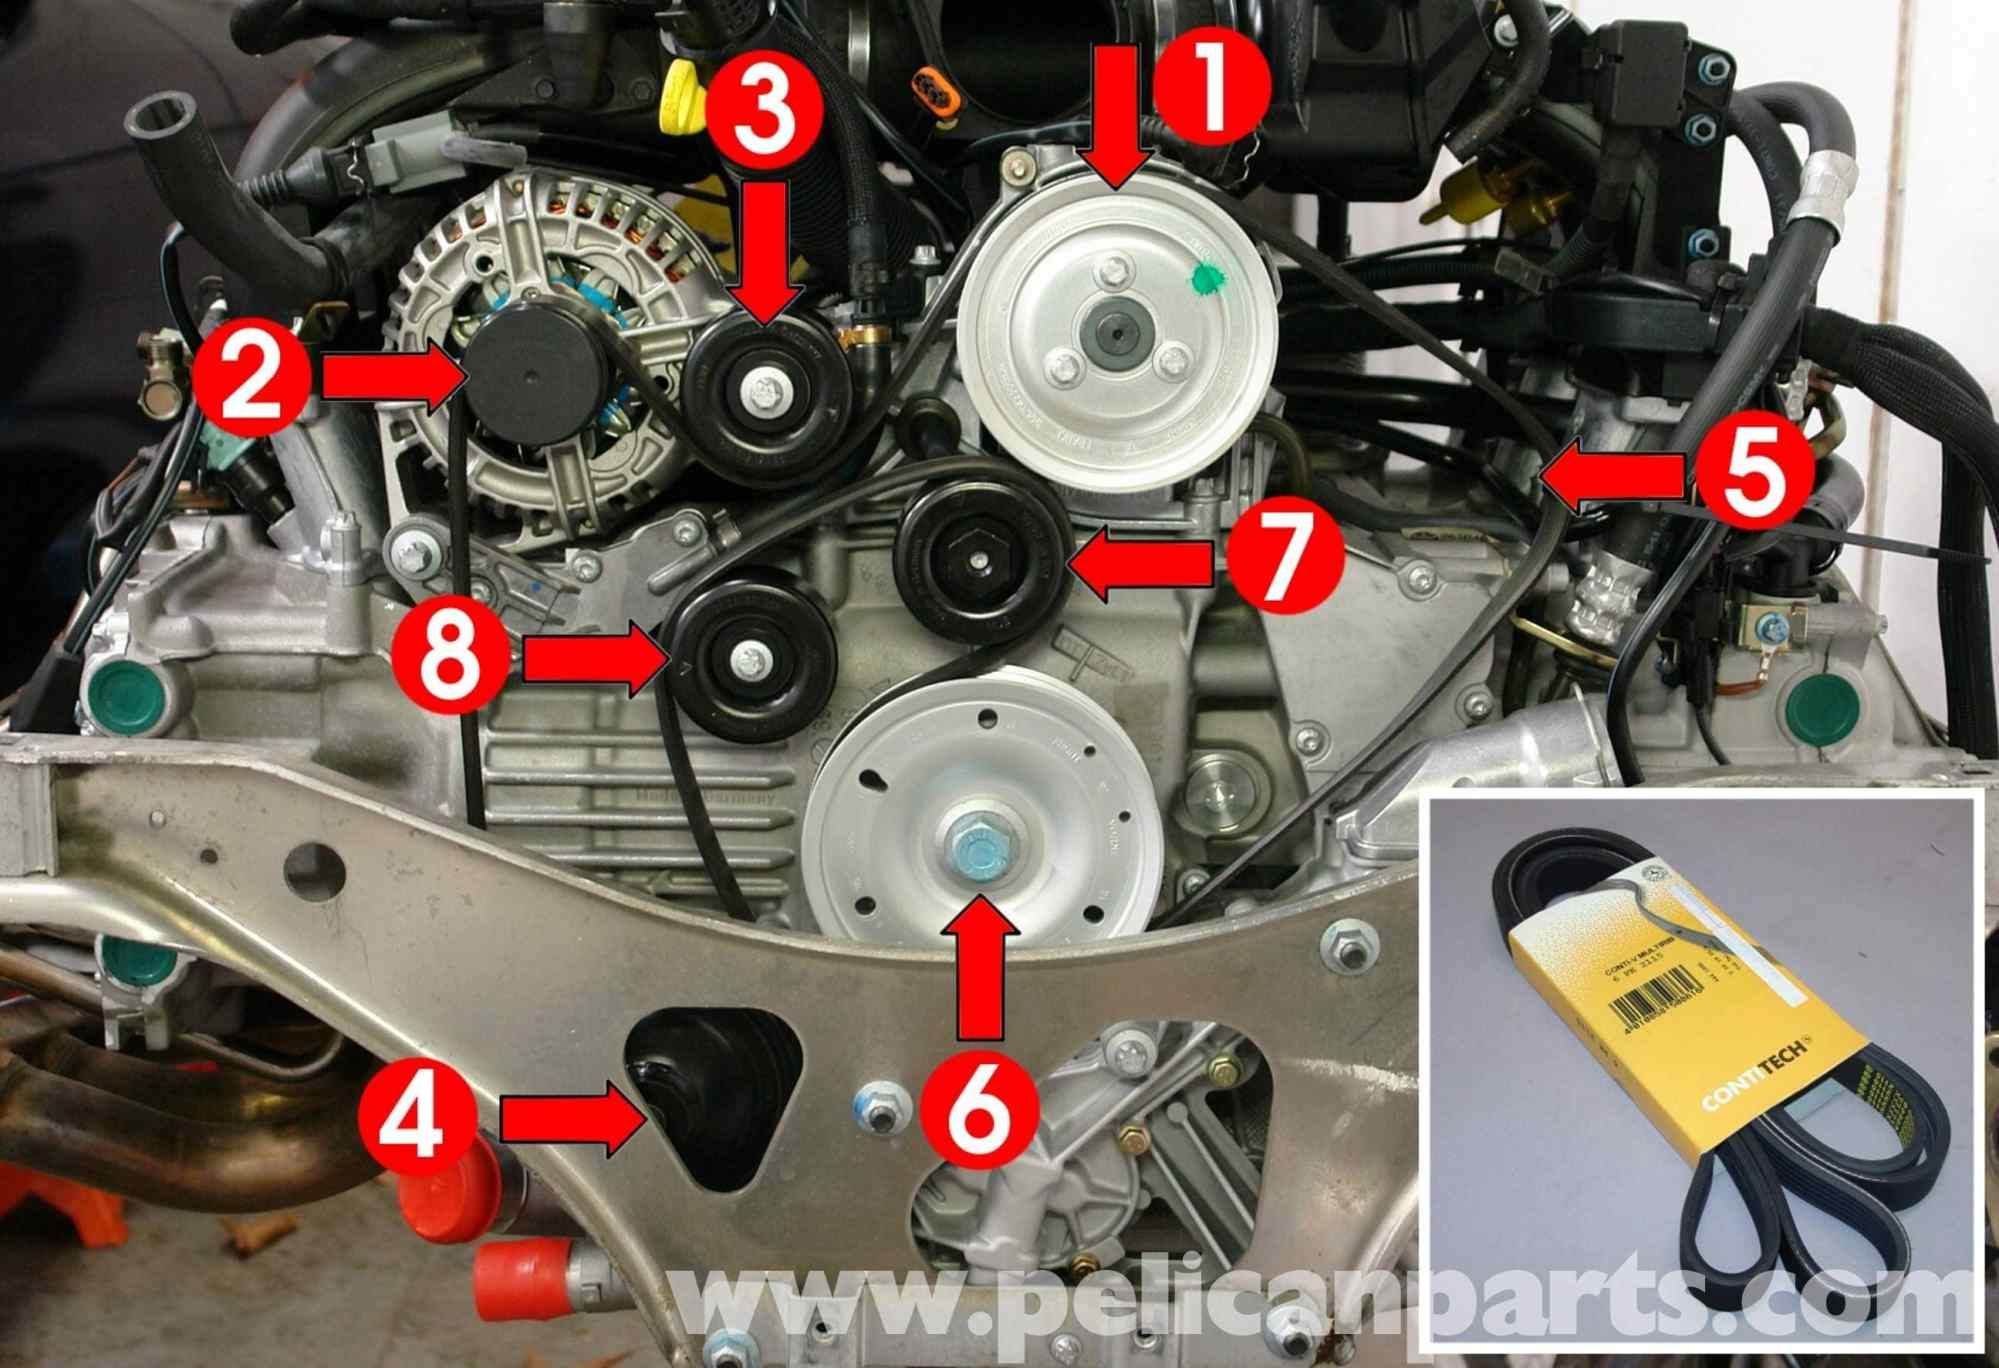 hight resolution of porsche boxster drive belt replacement 986 987 1997 08 rh pelicanparts com 2000 porsche boxster engine